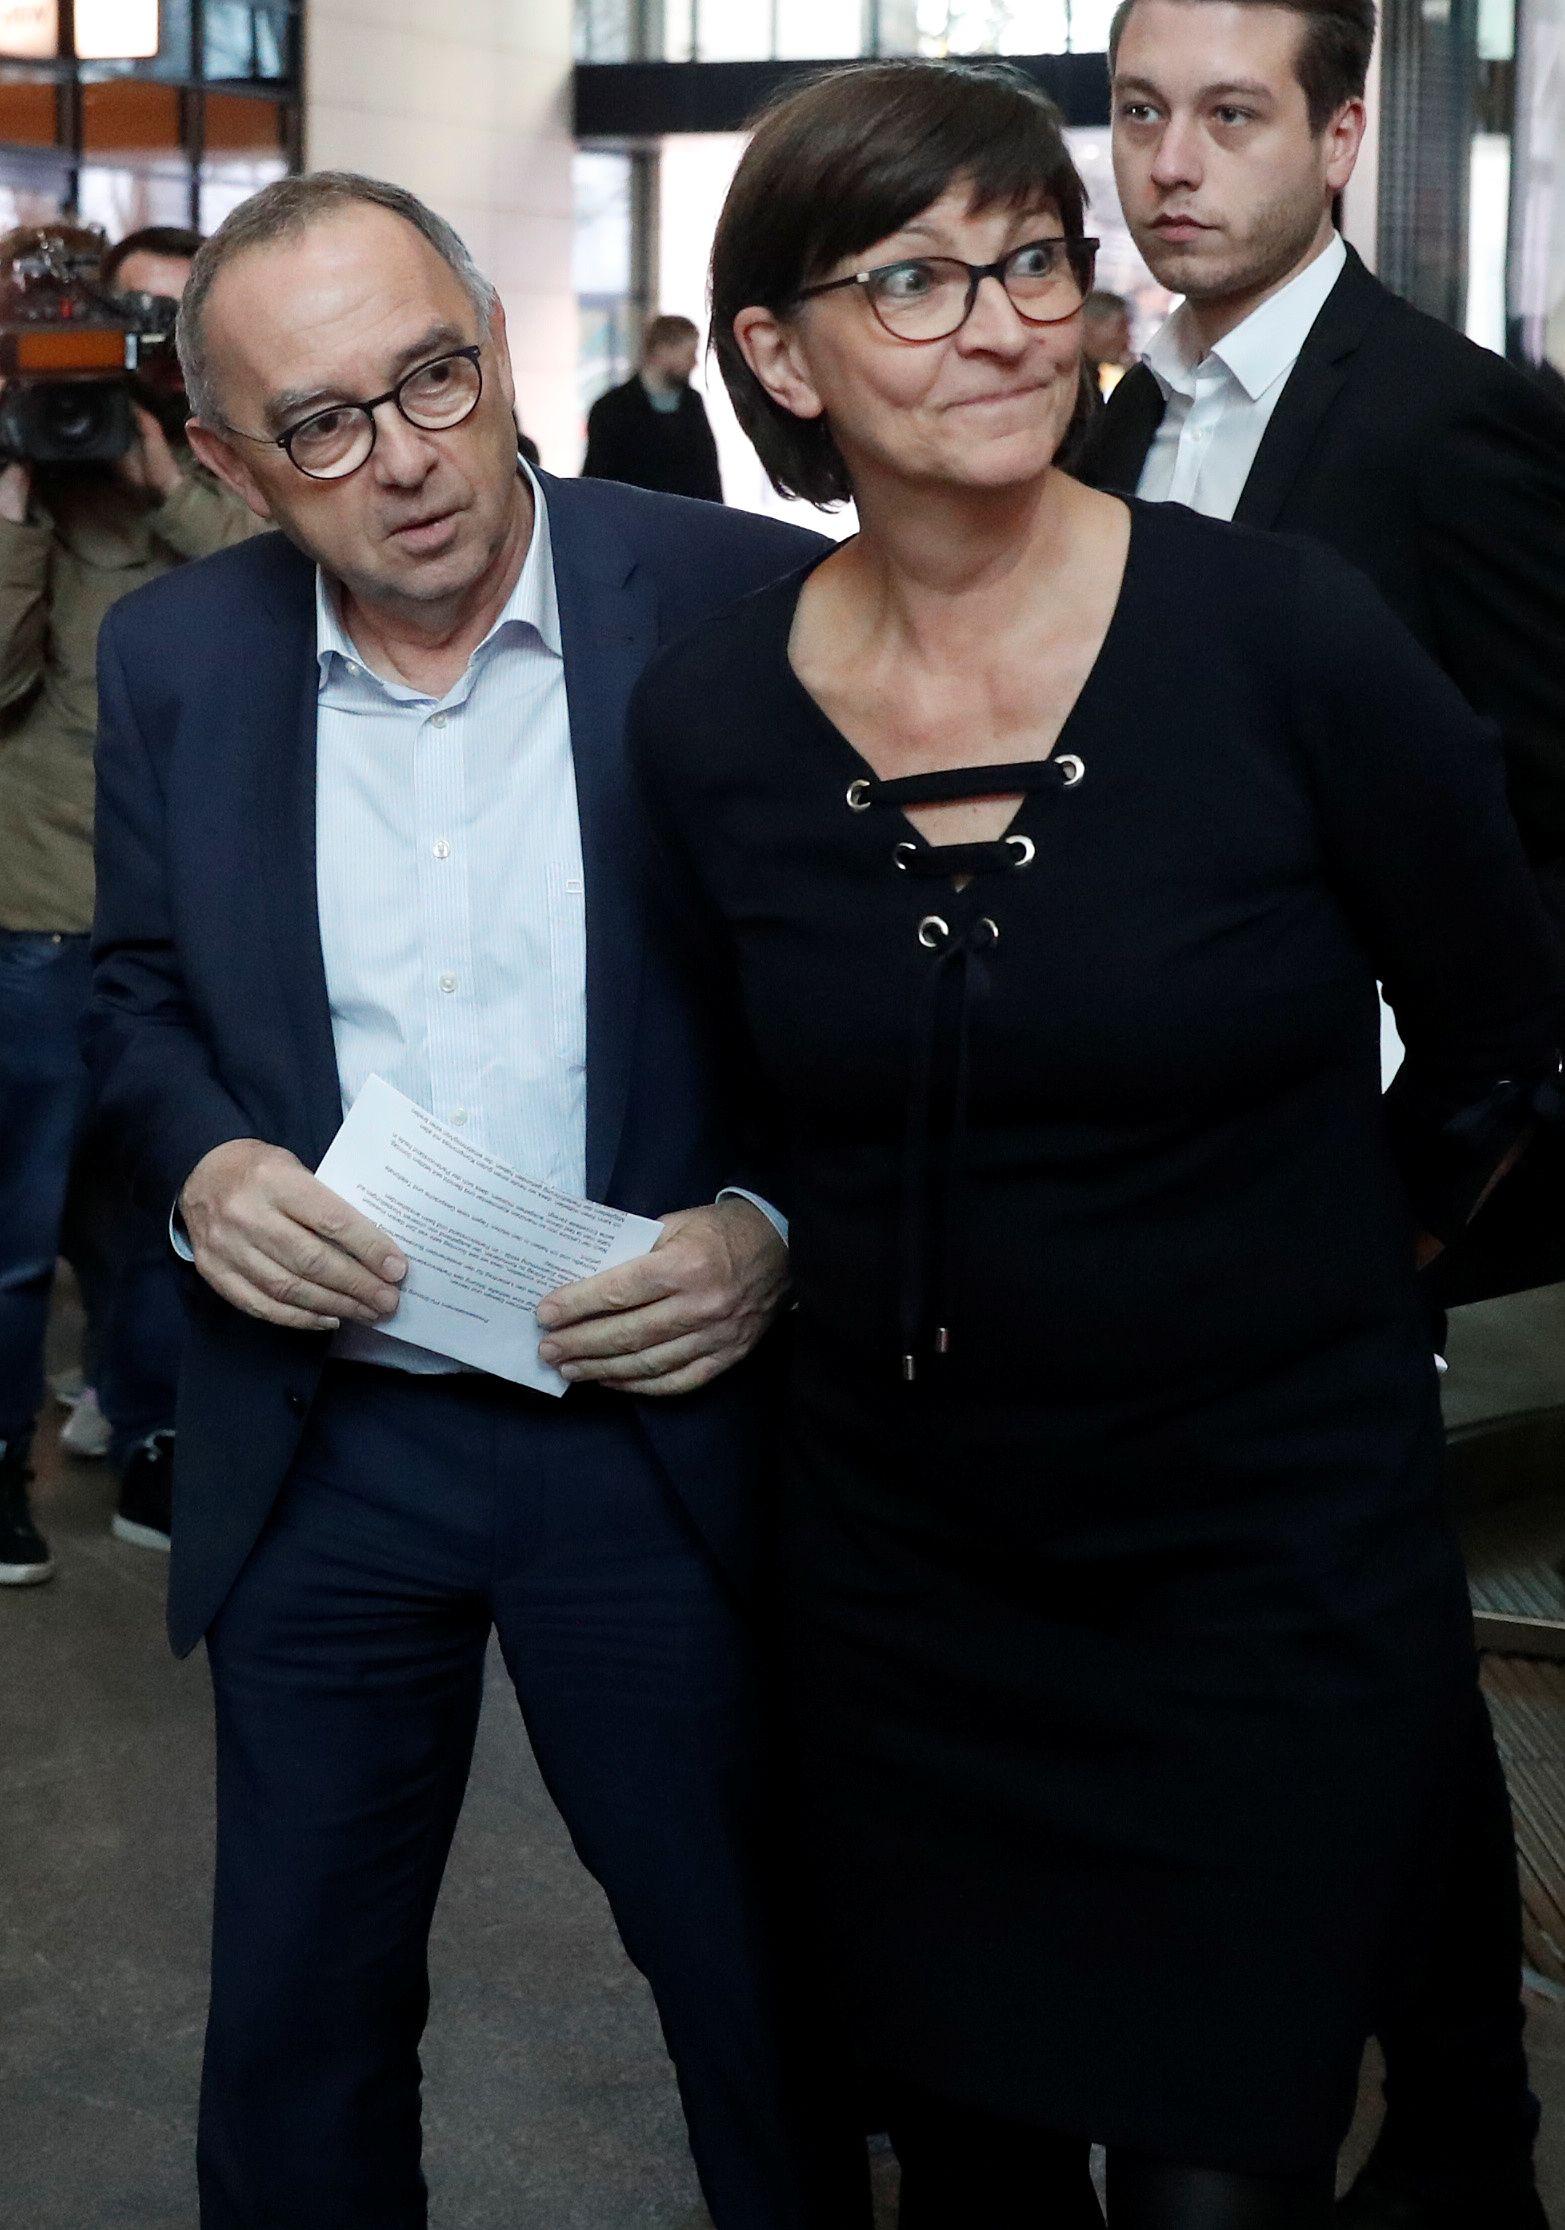 Esken / Walter-Borjans